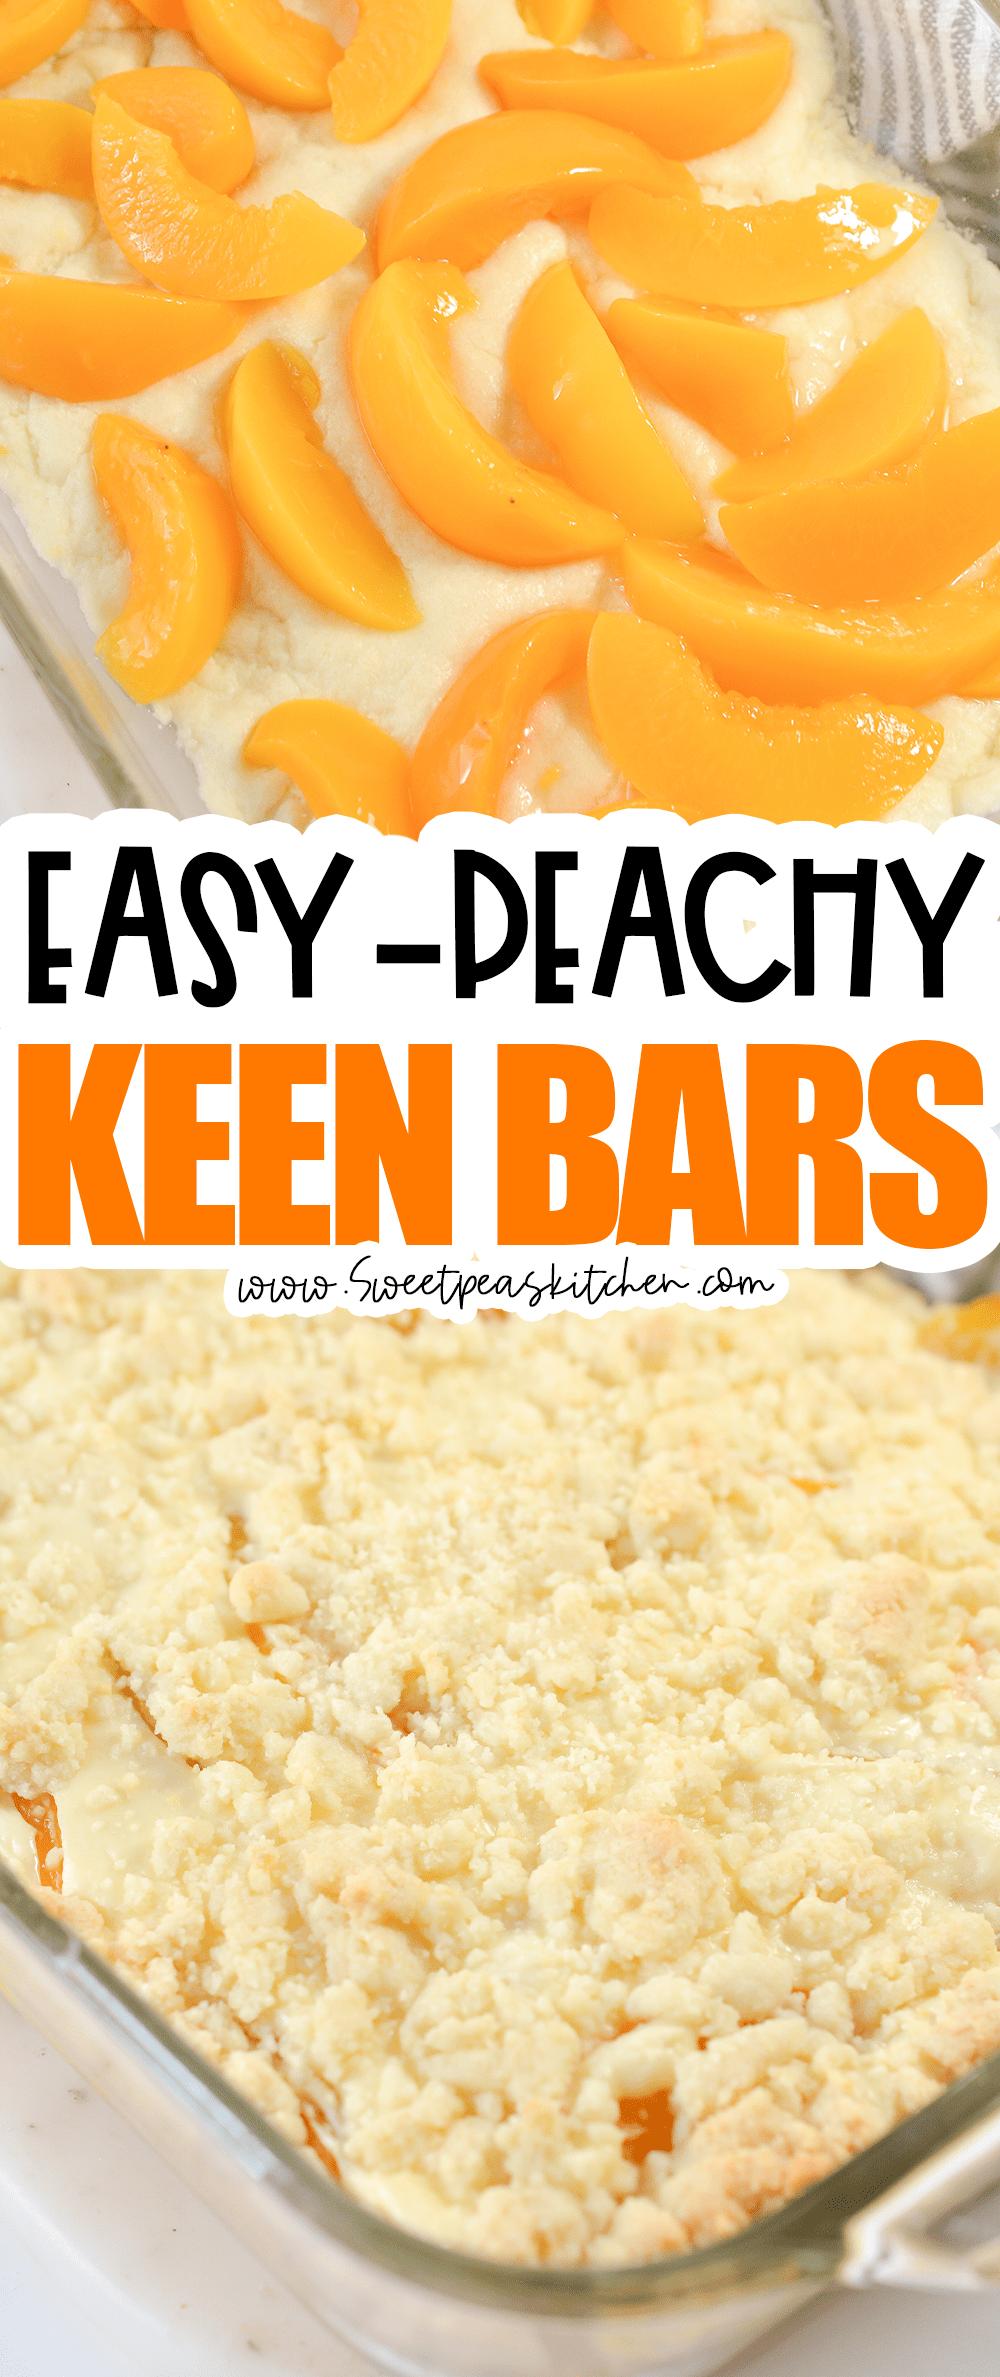 Peachy Keen Bars